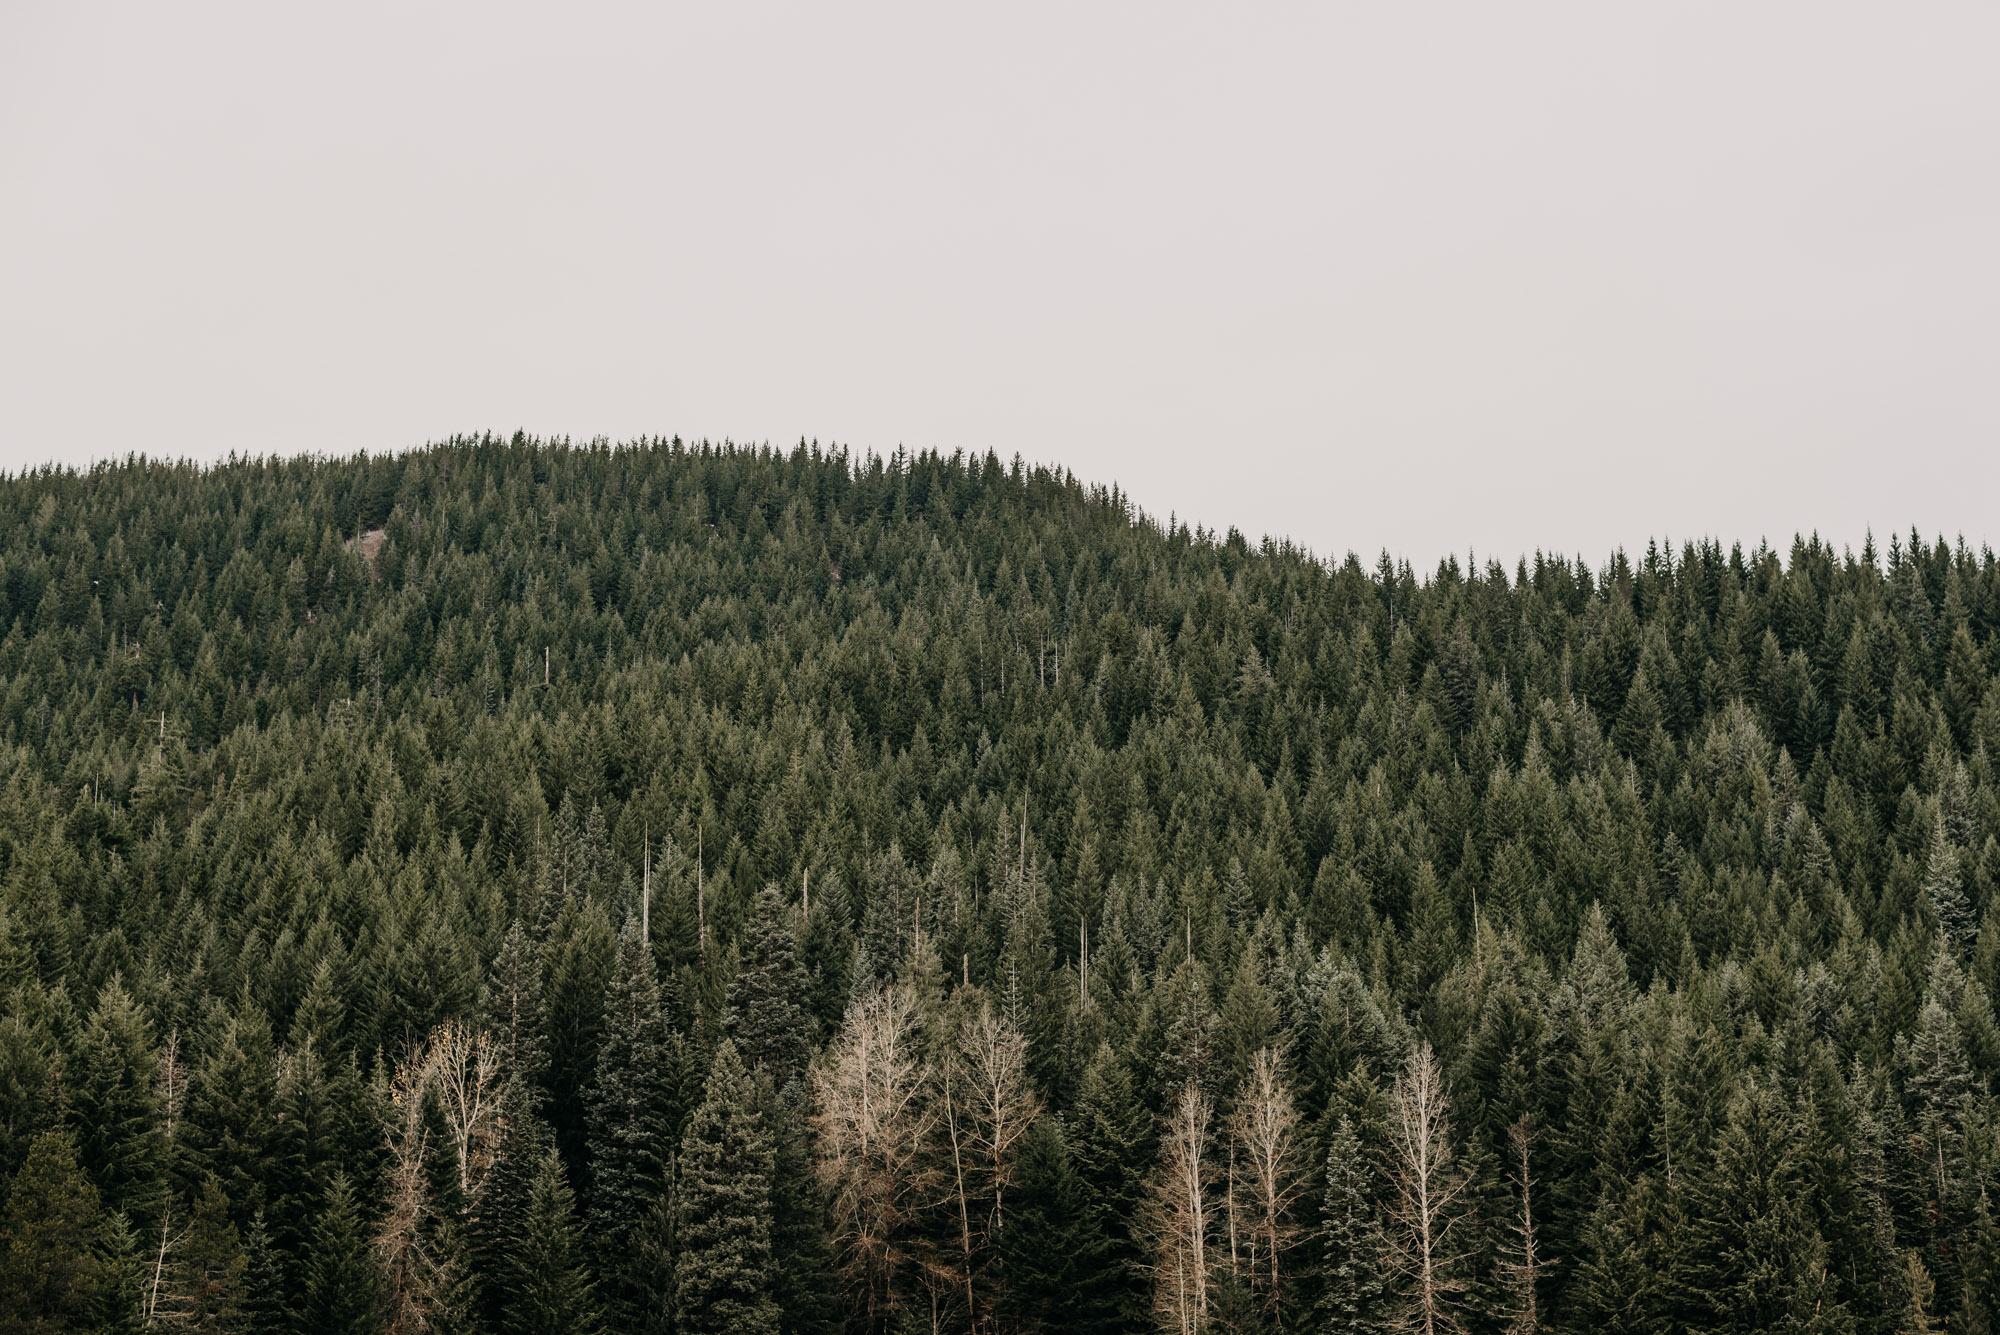 mt-hood-lake-trillium-engagement-session-woods-8545.jpg